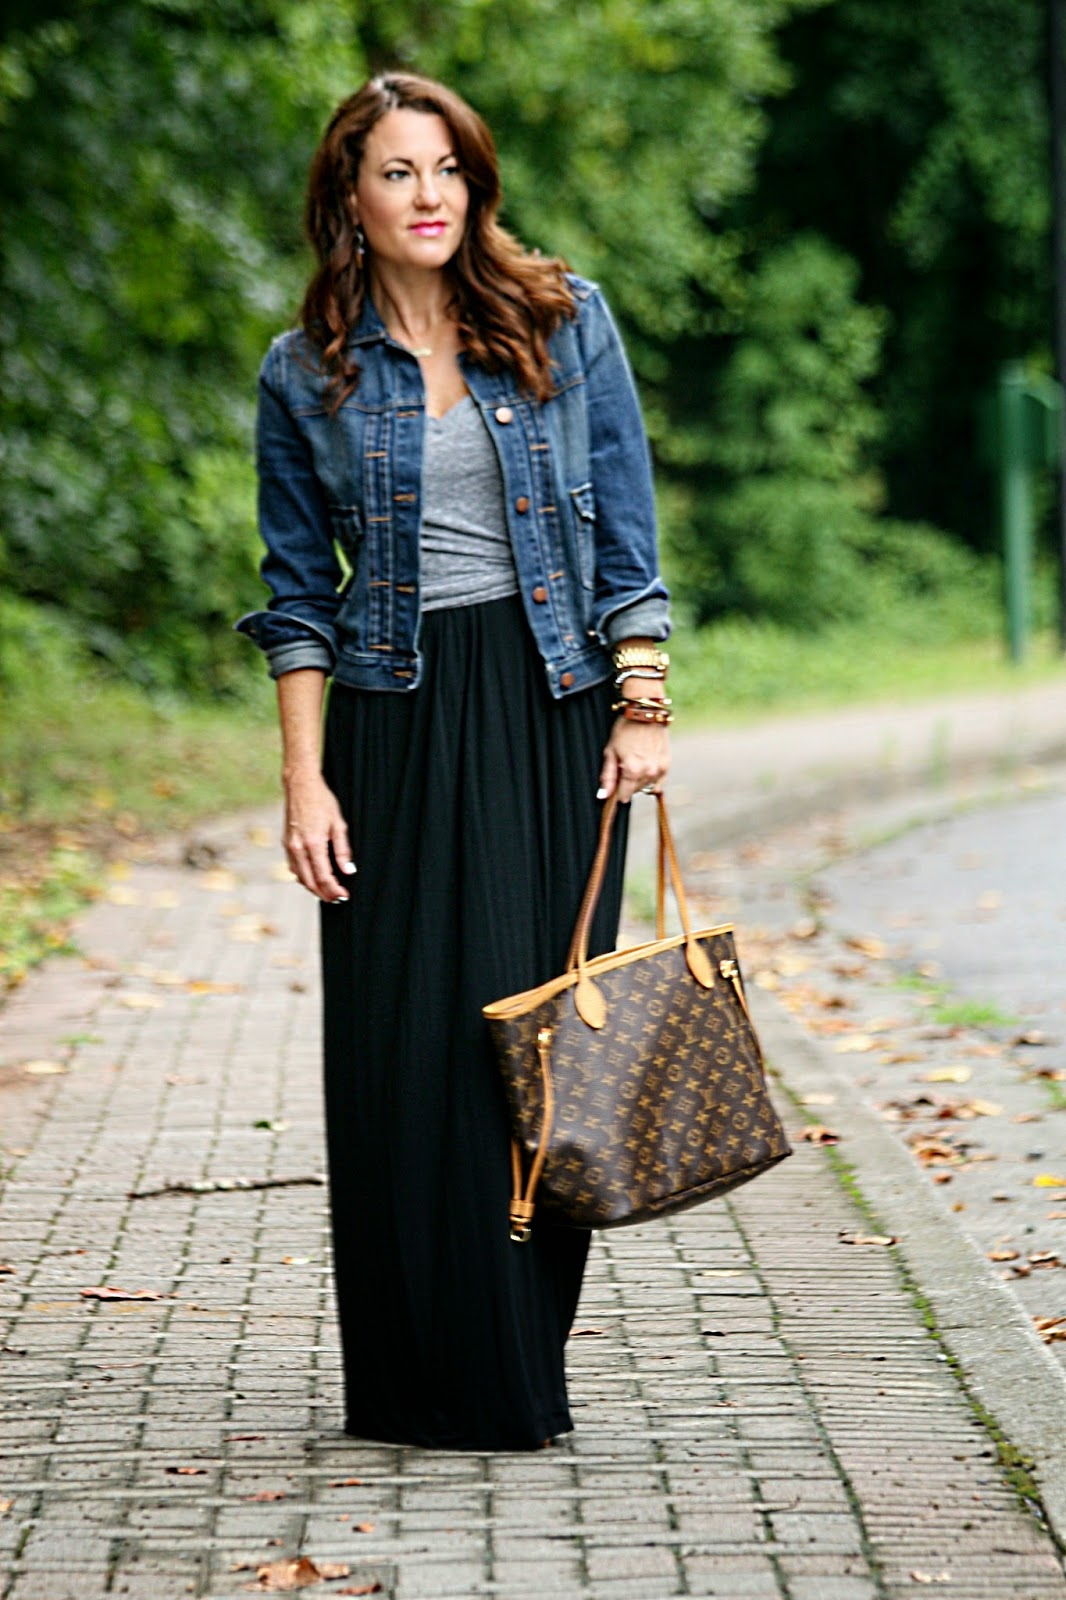 Jacket over maxi dress